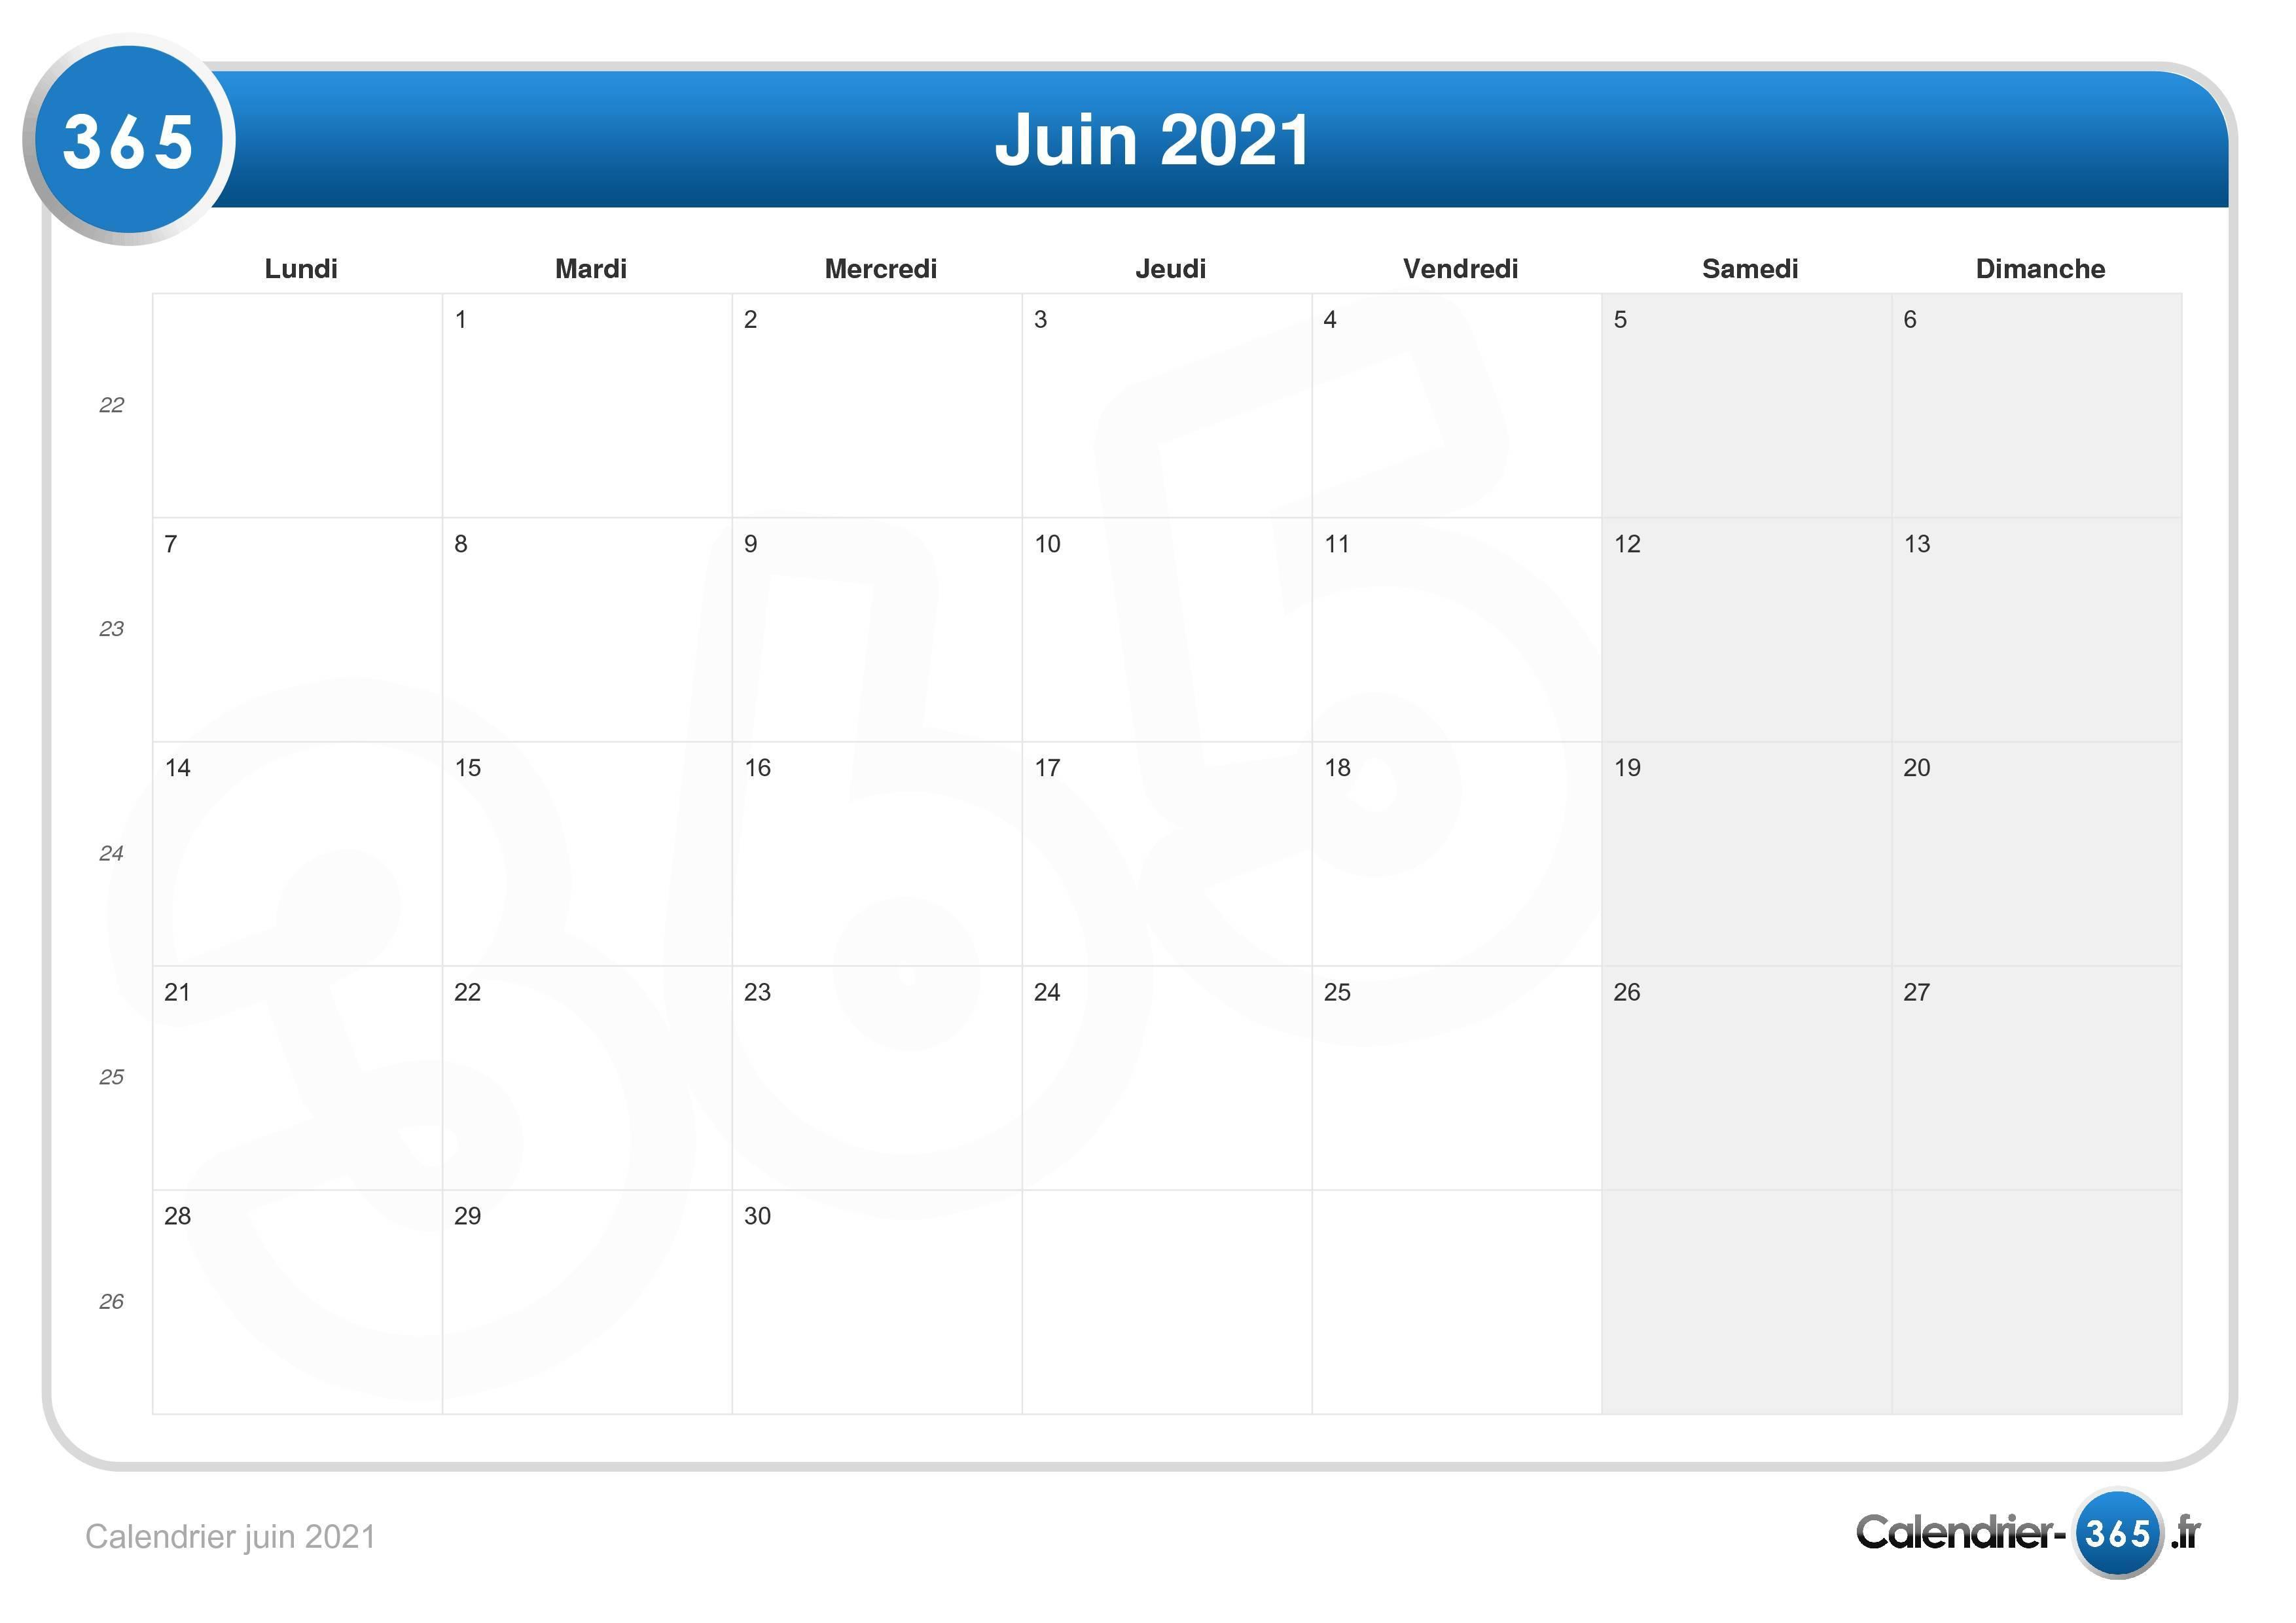 Juin 2021 Calendrier Calendrier juin 2021